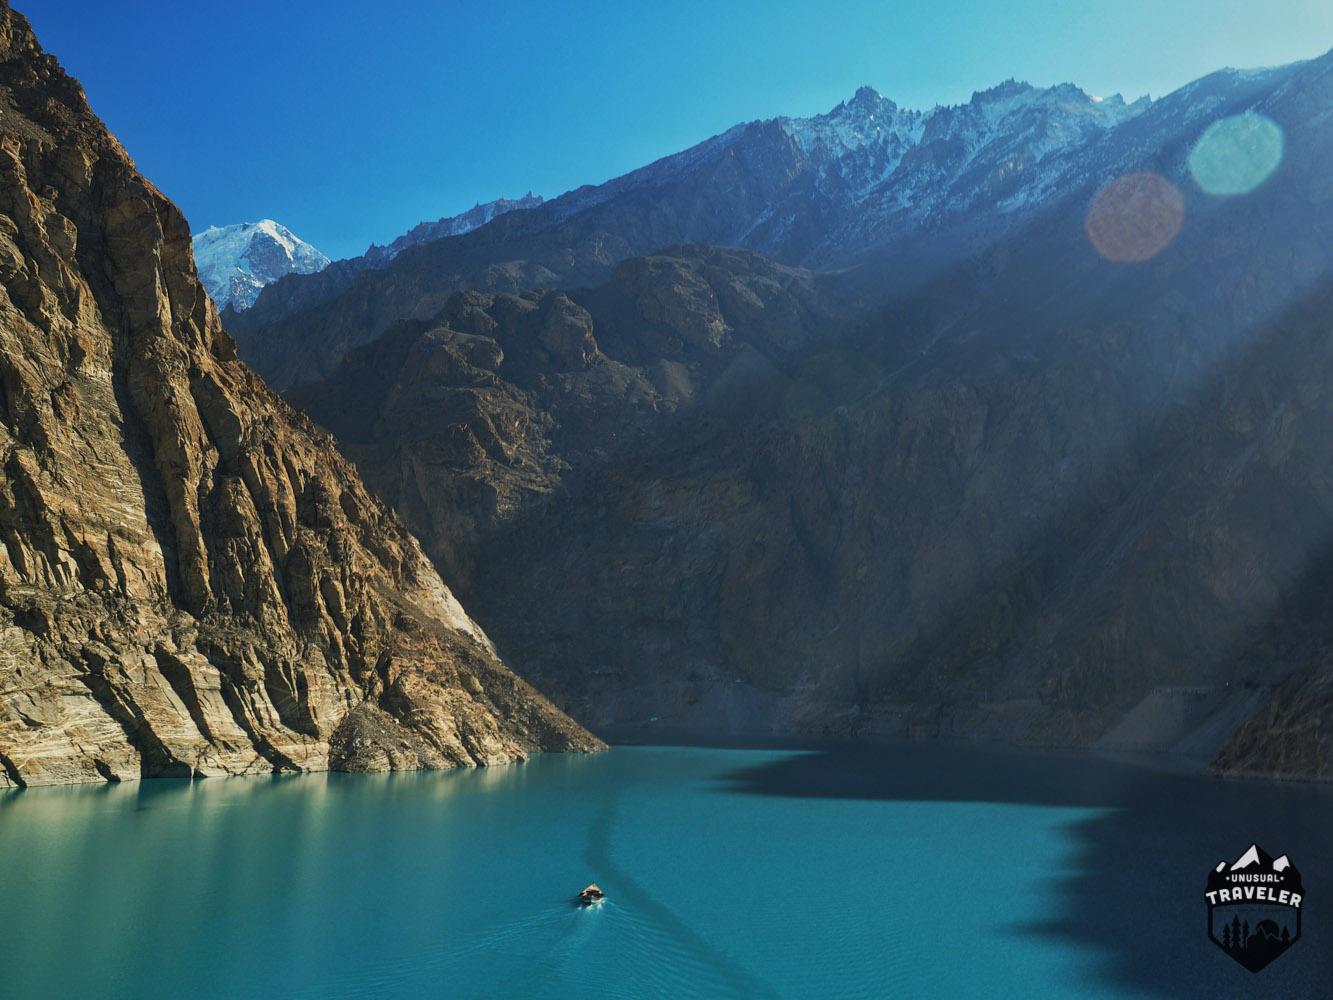 Crossing Attabad Lake, a journey on the Karakoram Highway